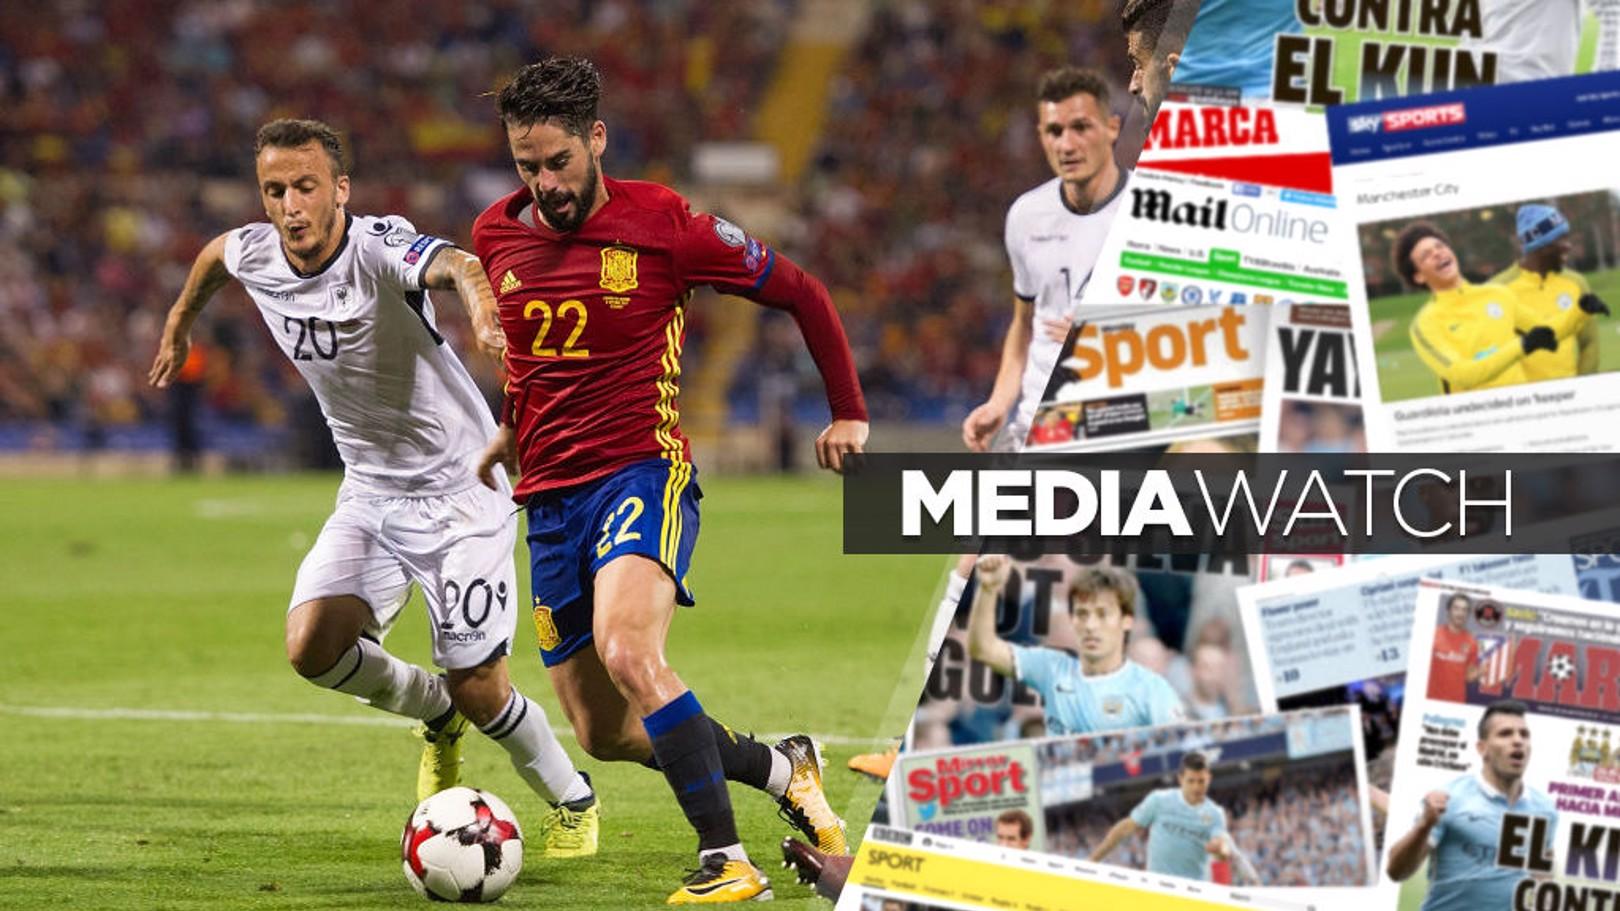 صحف تربط مانشستر سيتي بلاعب وسط ريال مدريد.